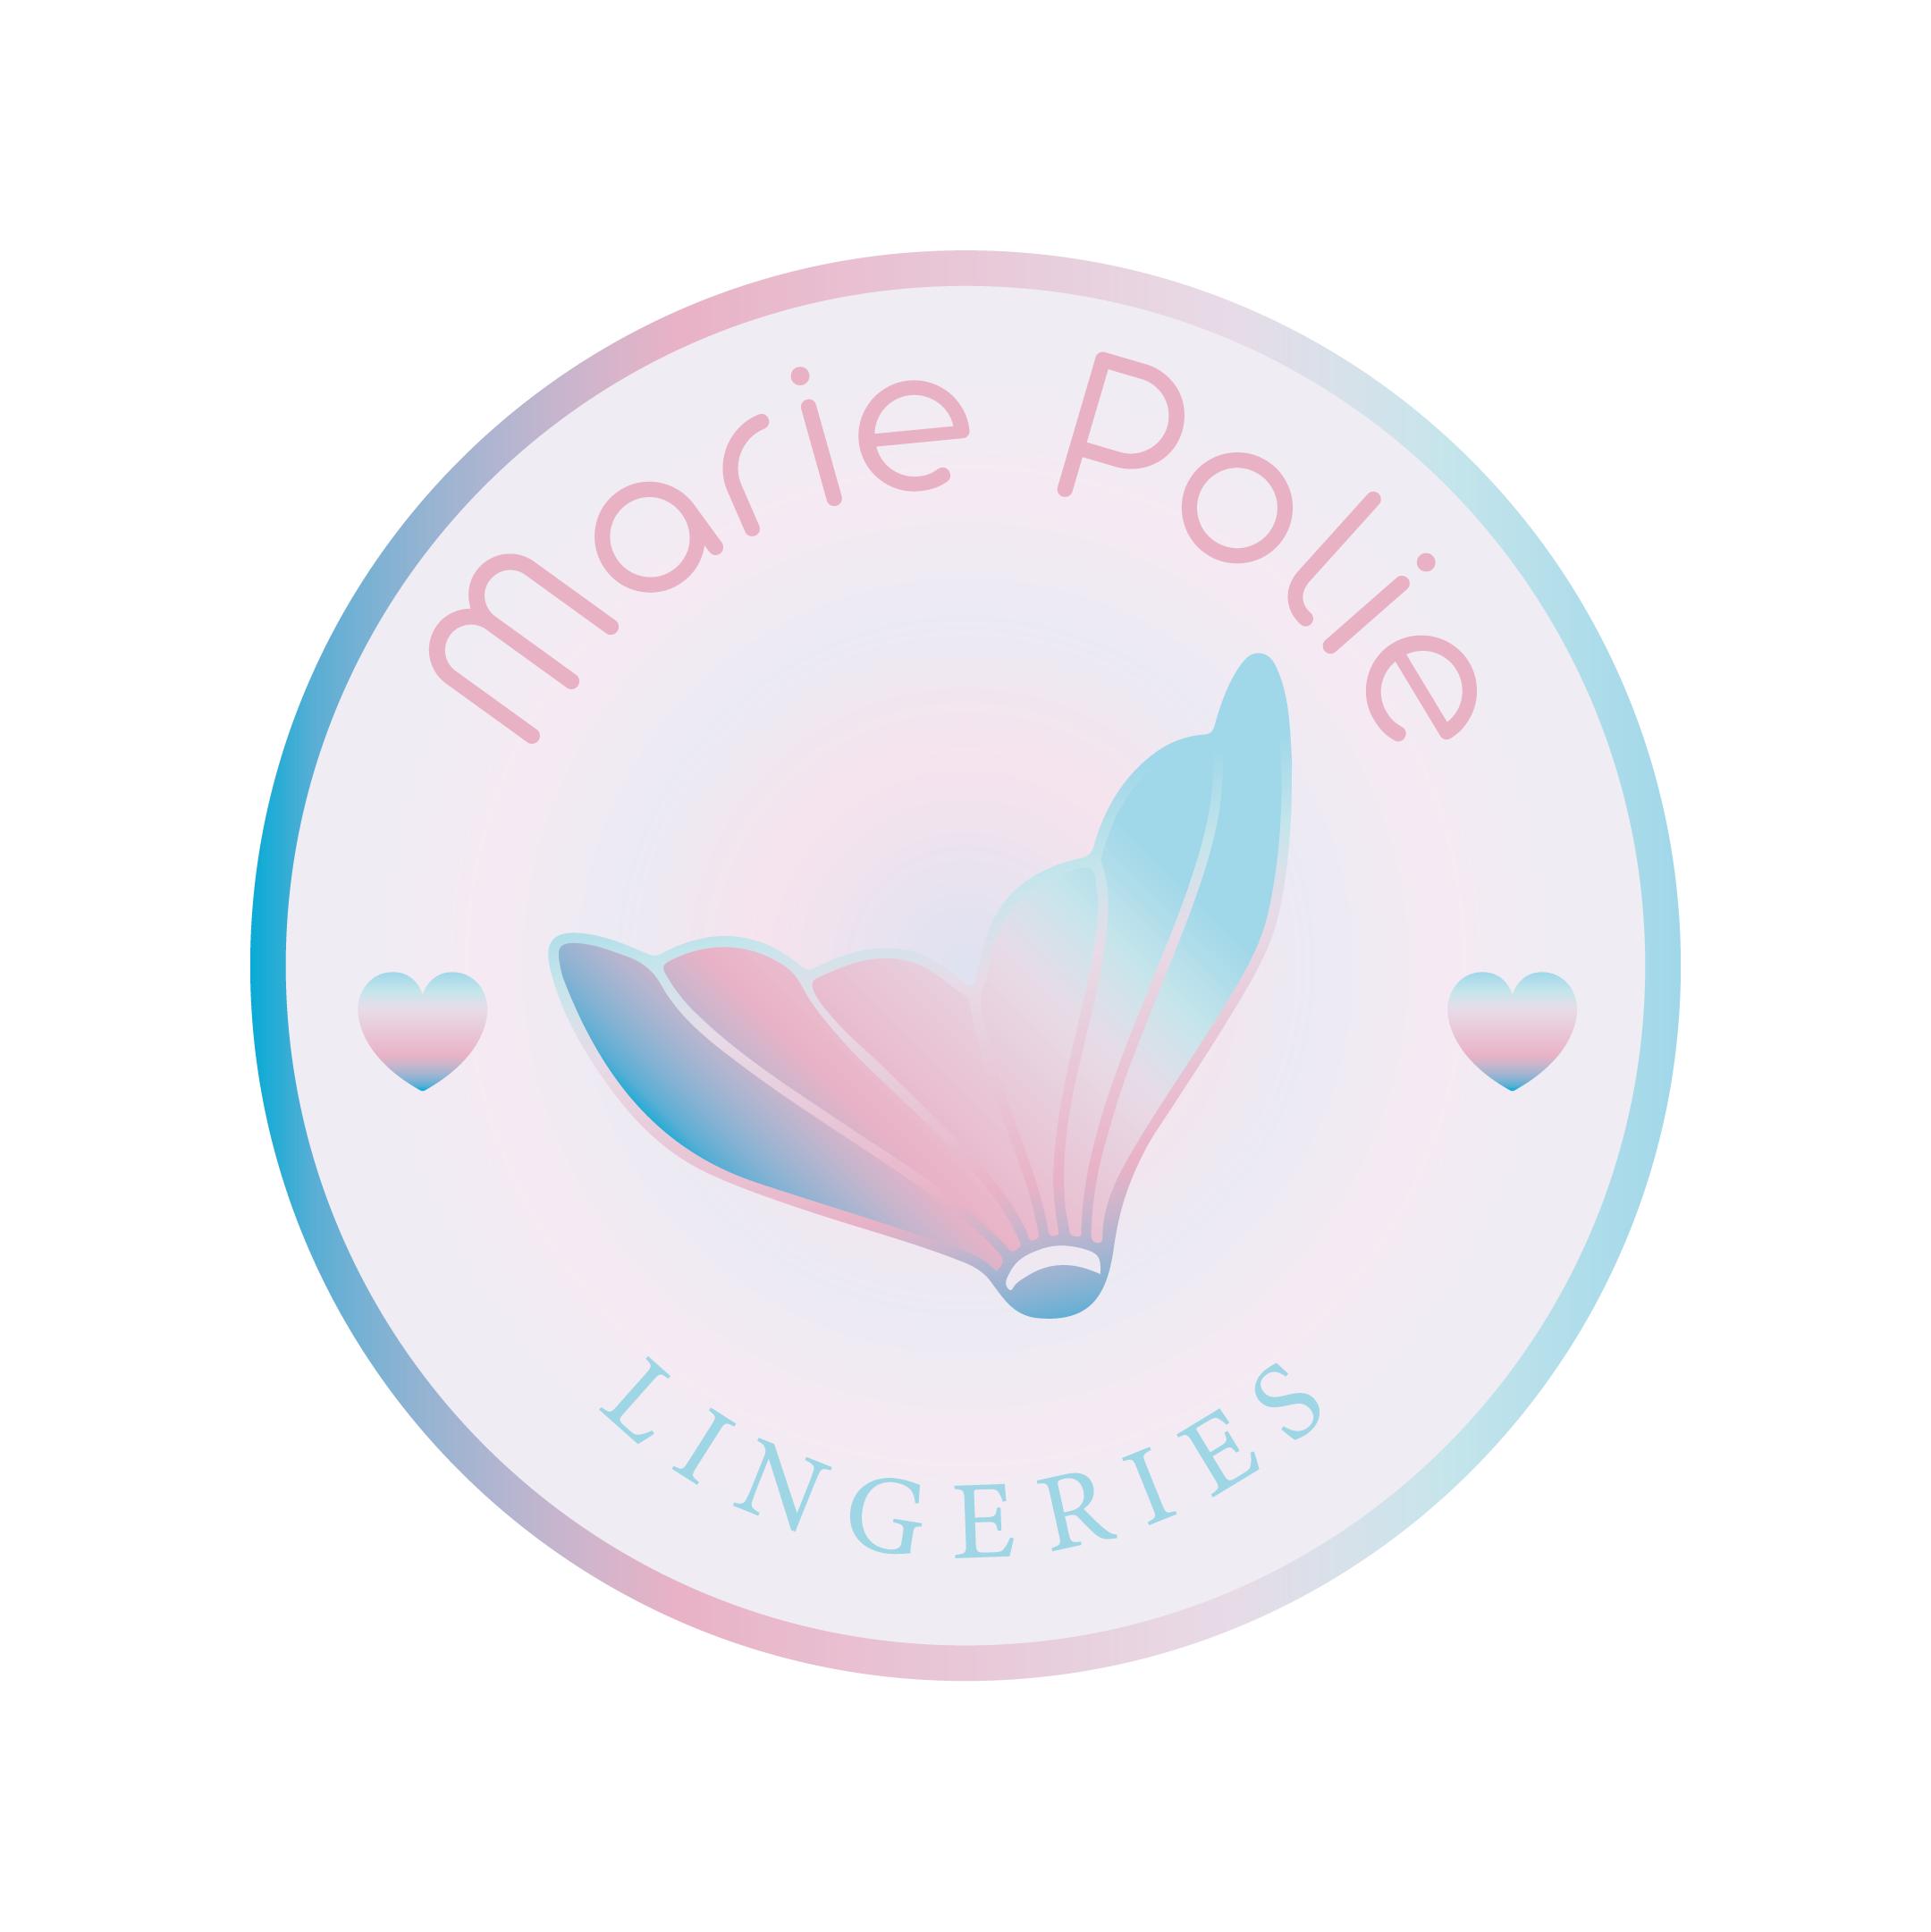 Marie Polie Modas